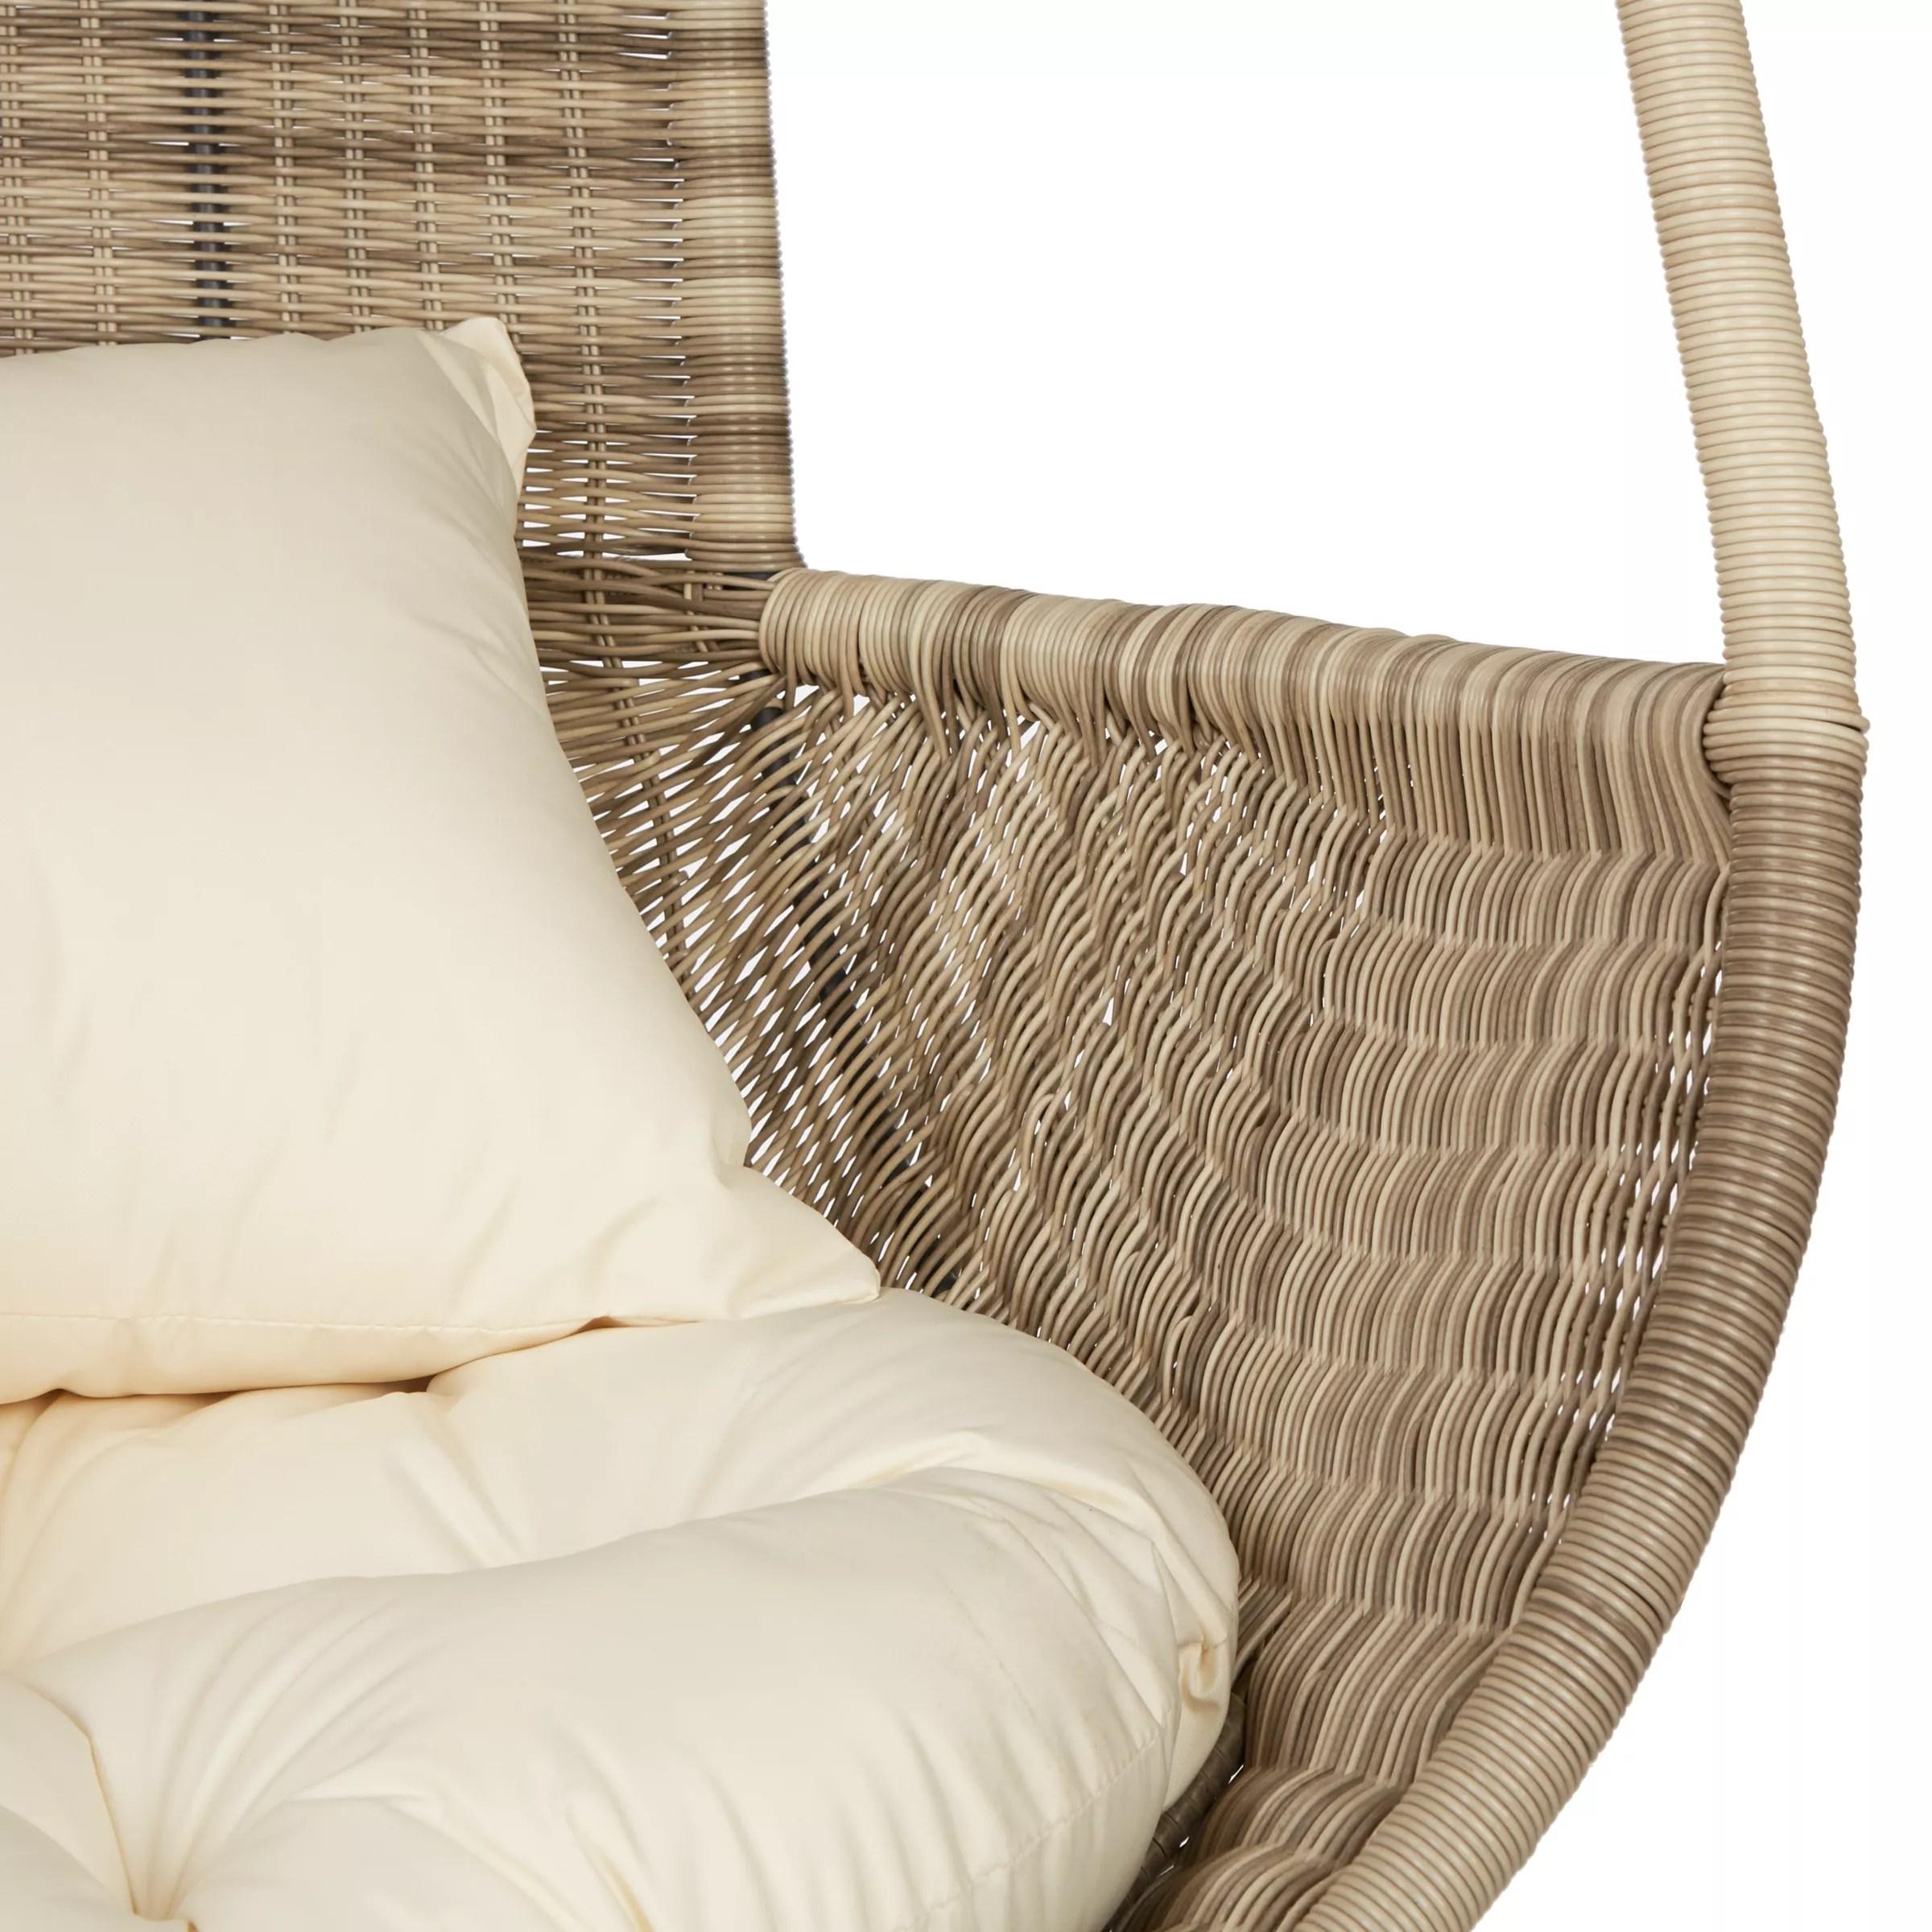 hanging chair qatar covers white spandex buy john lewis dante pod  